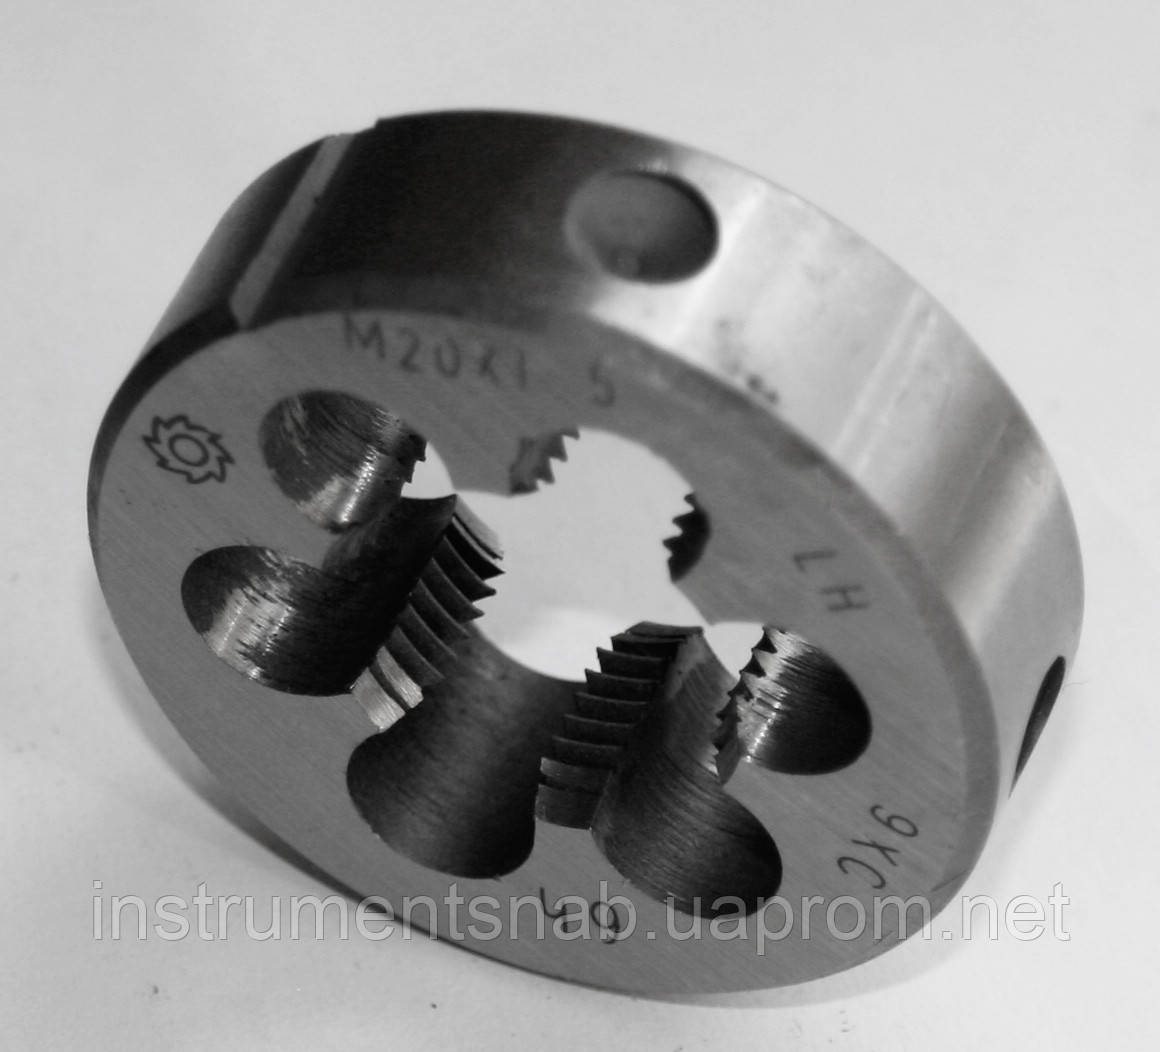 Плашка левая М-20х1,5 LH, 9ХС, (45/18 мм), мелкий шаг